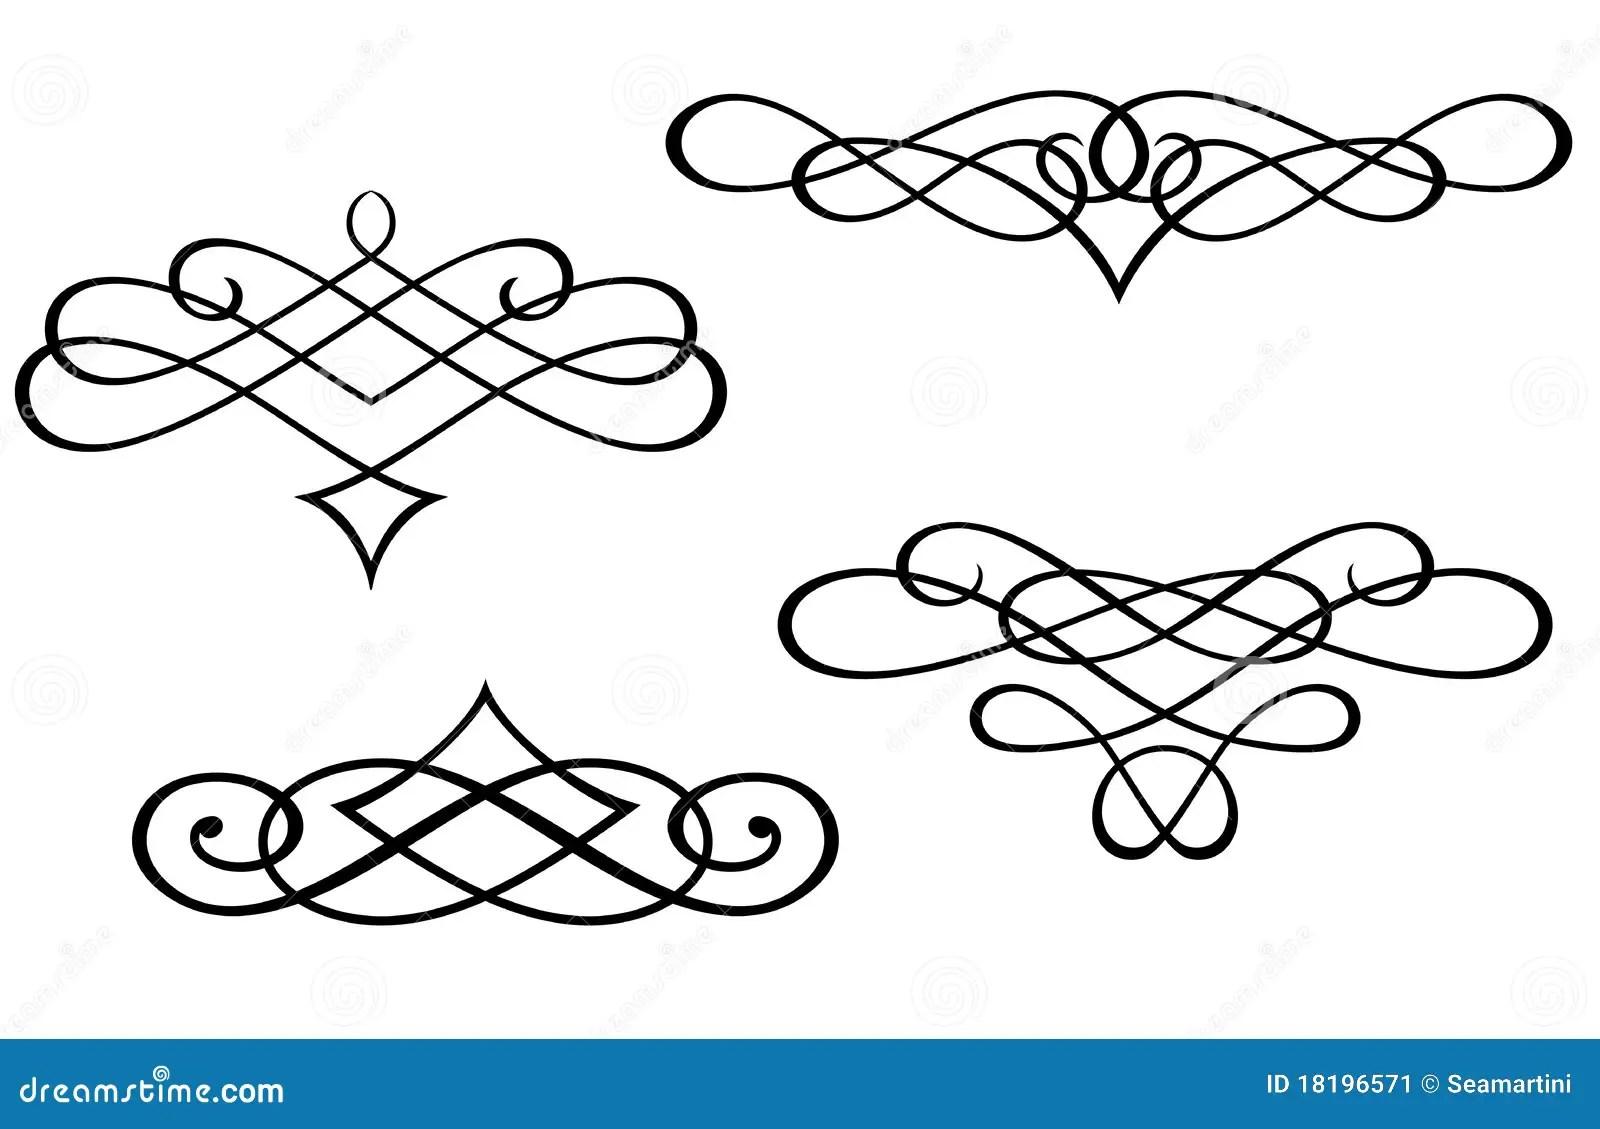 Monograms And Swirl Elements Stock Vector